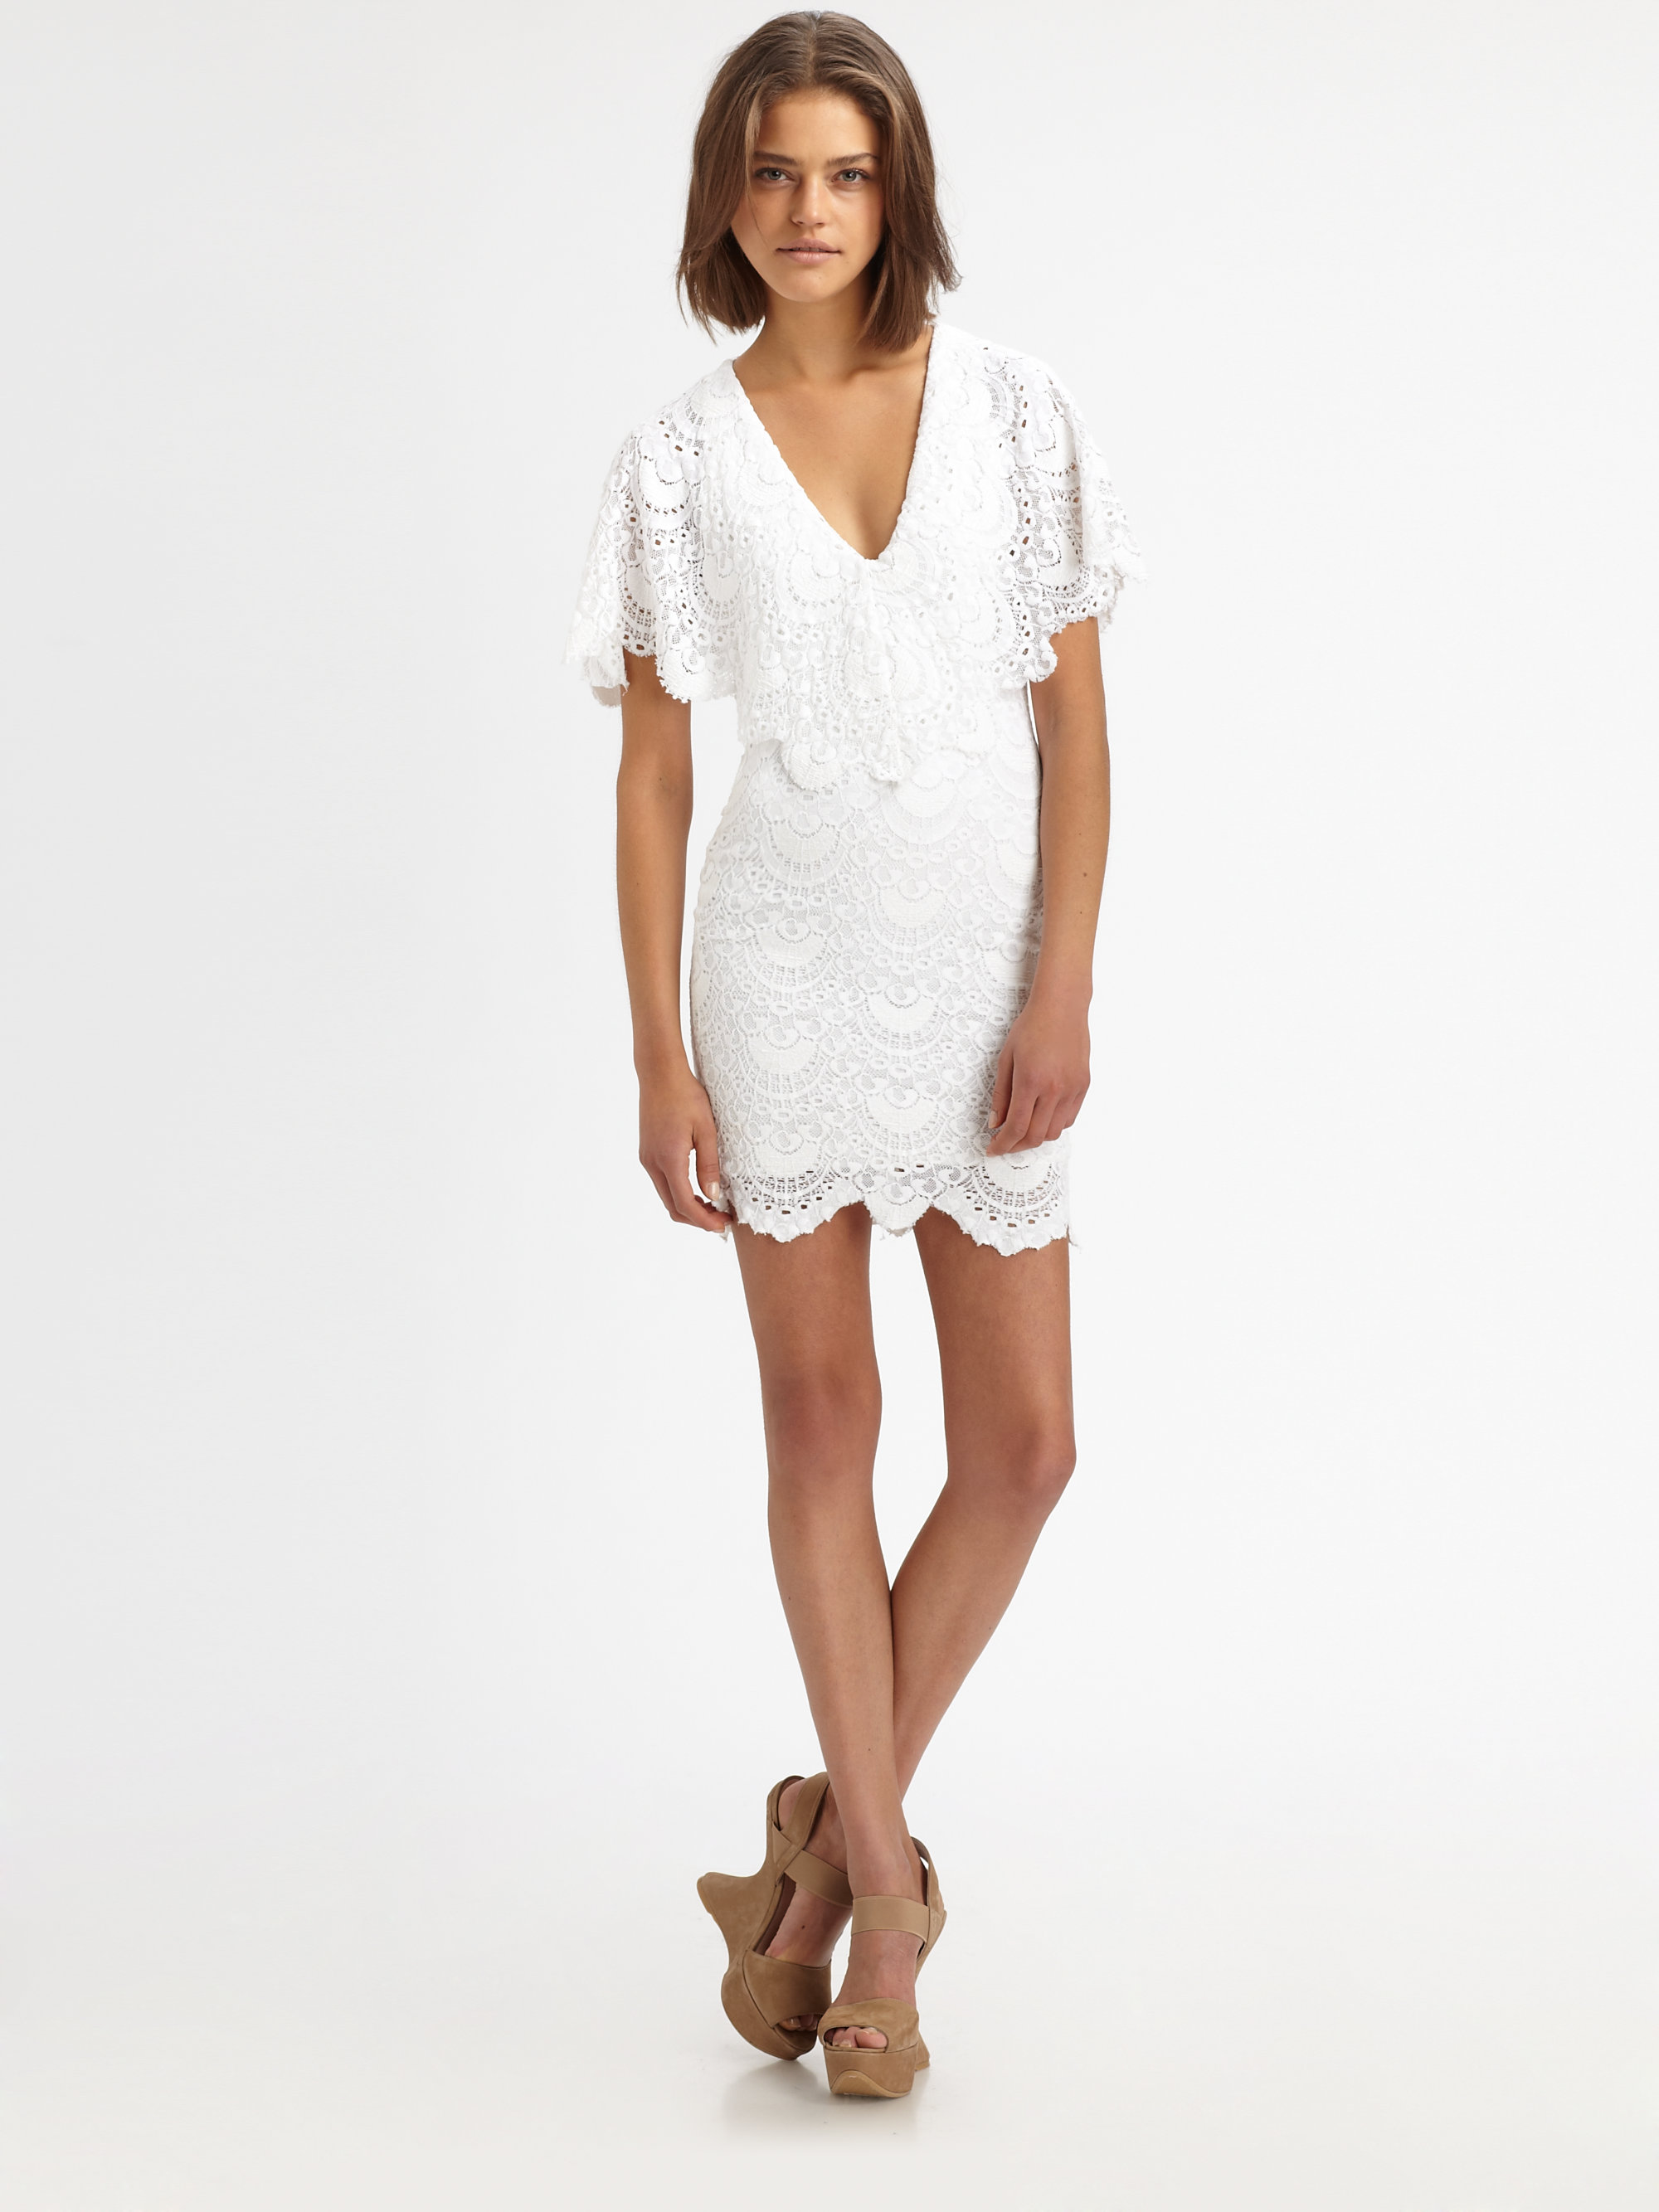 6415f98cc0 Nightcap Spanish Lace Poncho Dress in White - Lyst